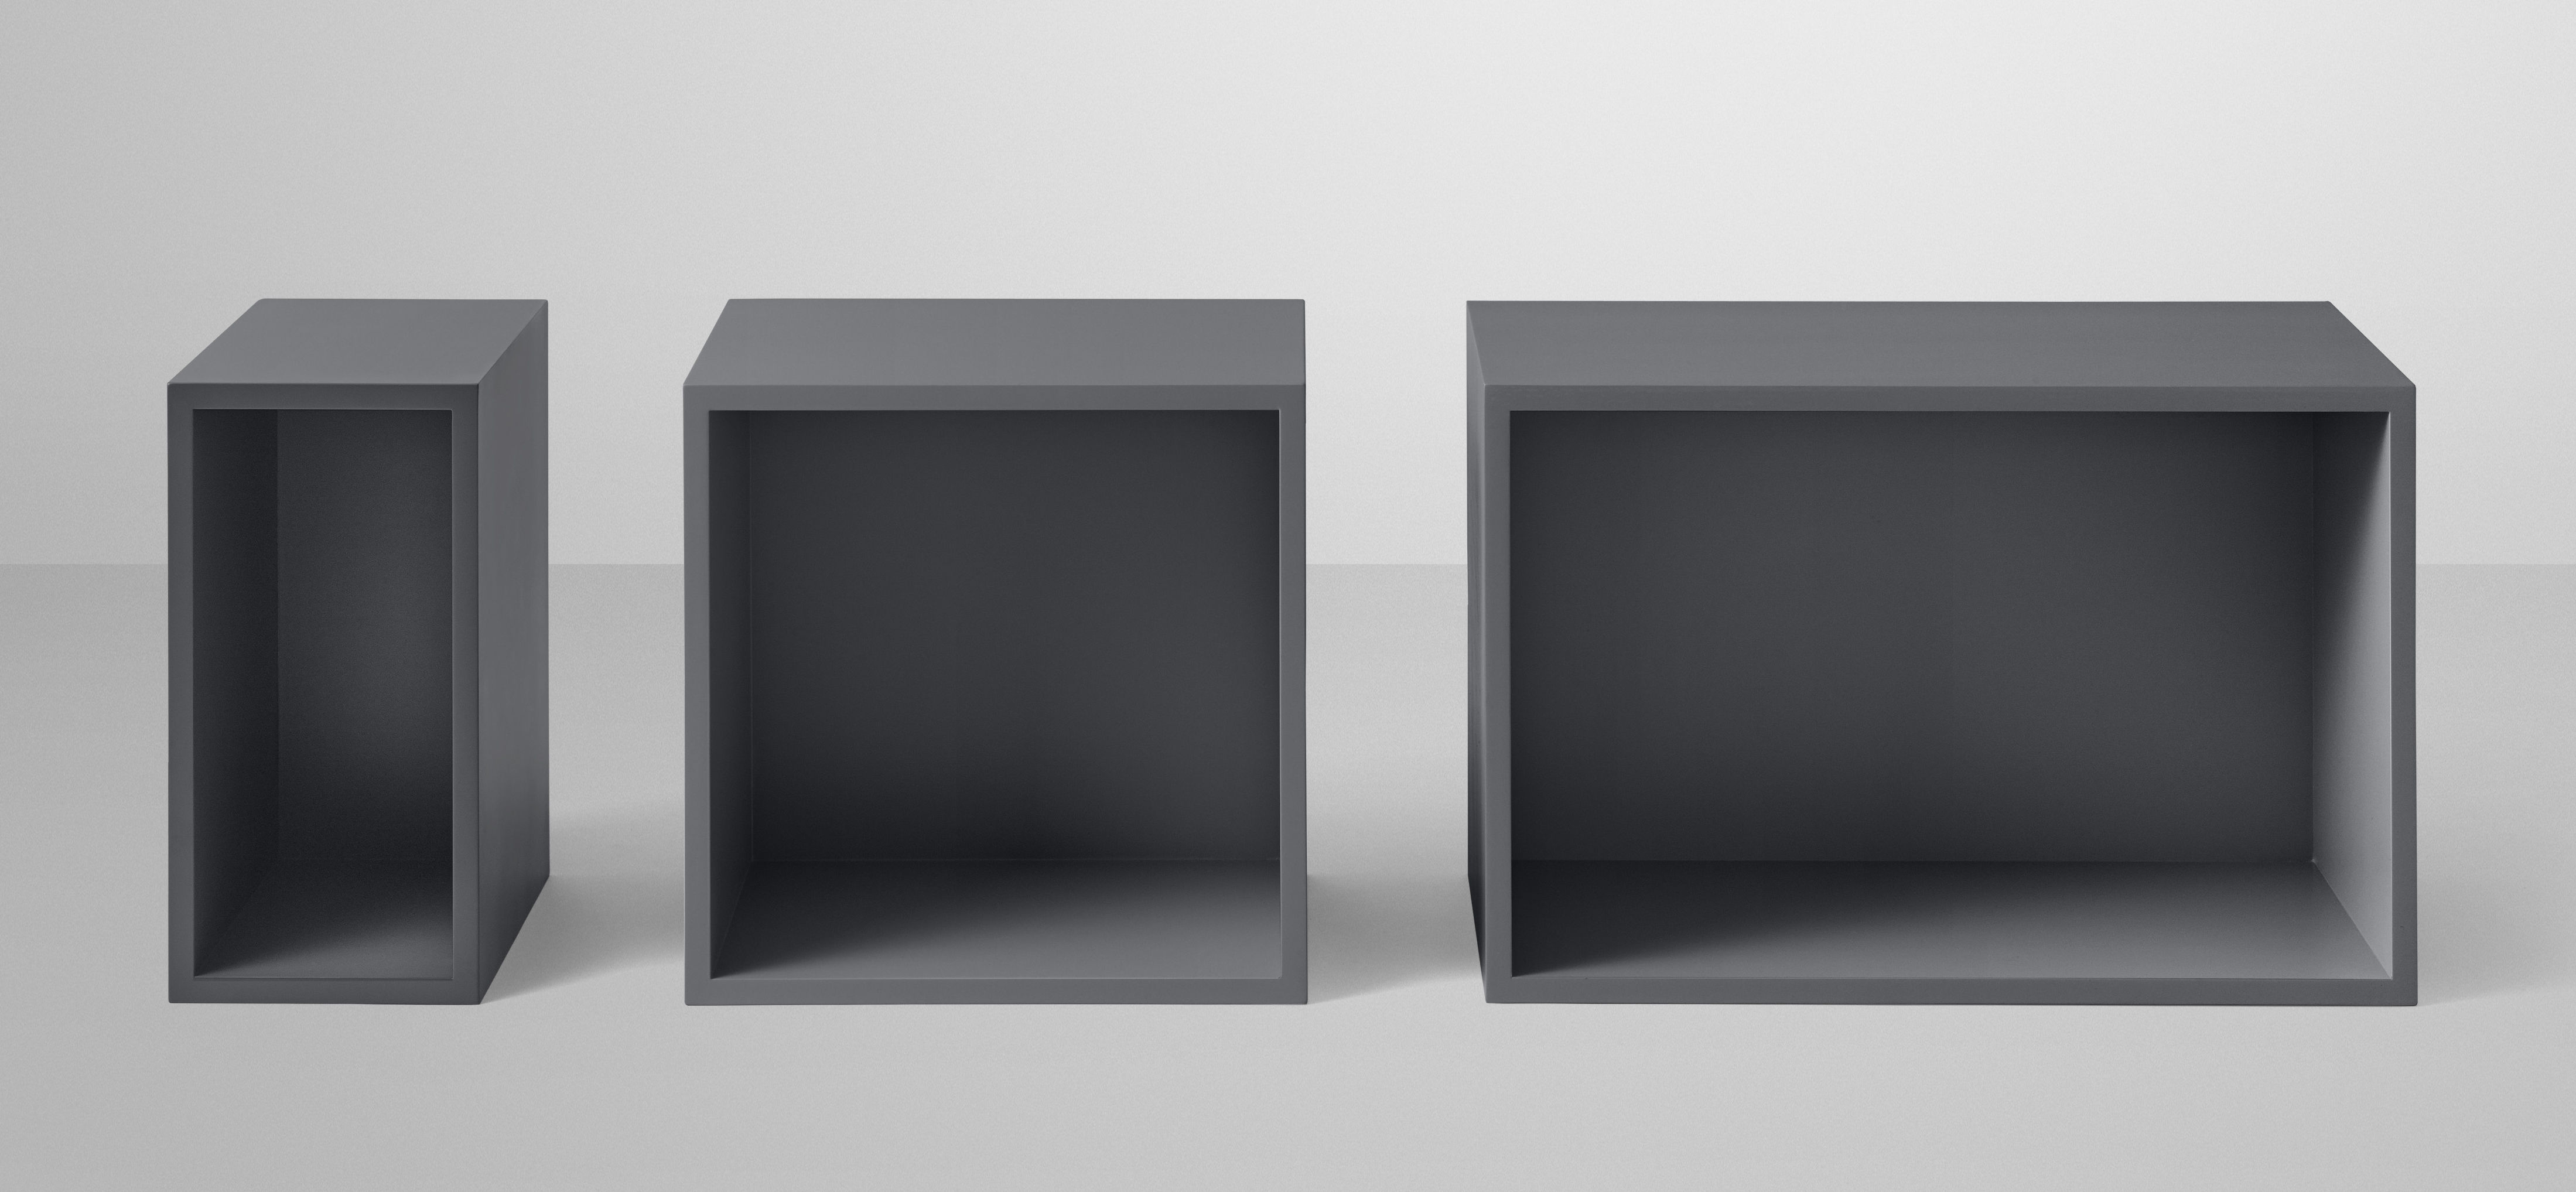 etag re stacked medium carr 43x43 cm avec fond gris fonc muuto. Black Bedroom Furniture Sets. Home Design Ideas